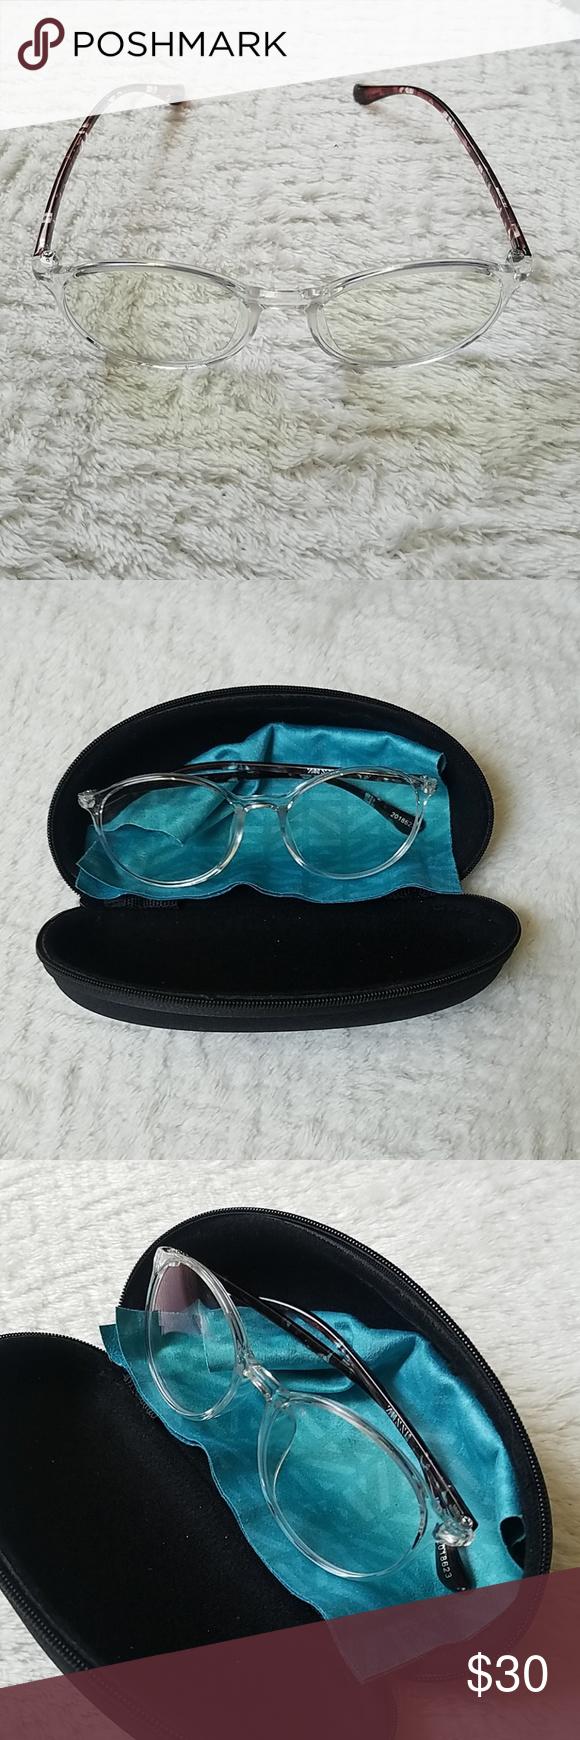 8aecc747d2 Zenni Optical blue light lenses Non prescription glasses. These are meant  for editing